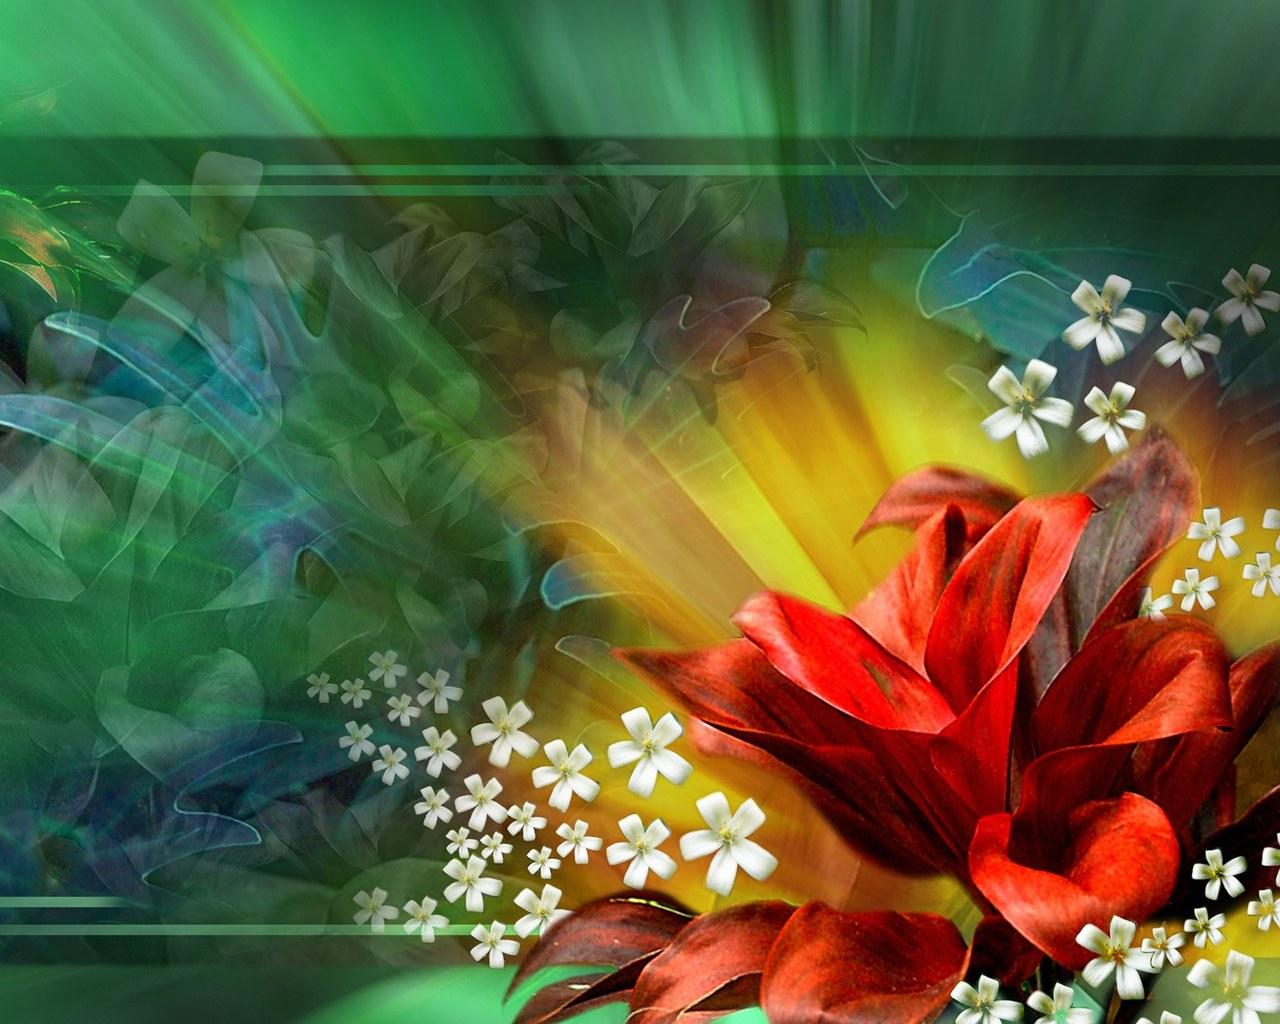 Desktop Backgrounds Wallpaper PC 3D Graphics Cherry 3d 1280x1024